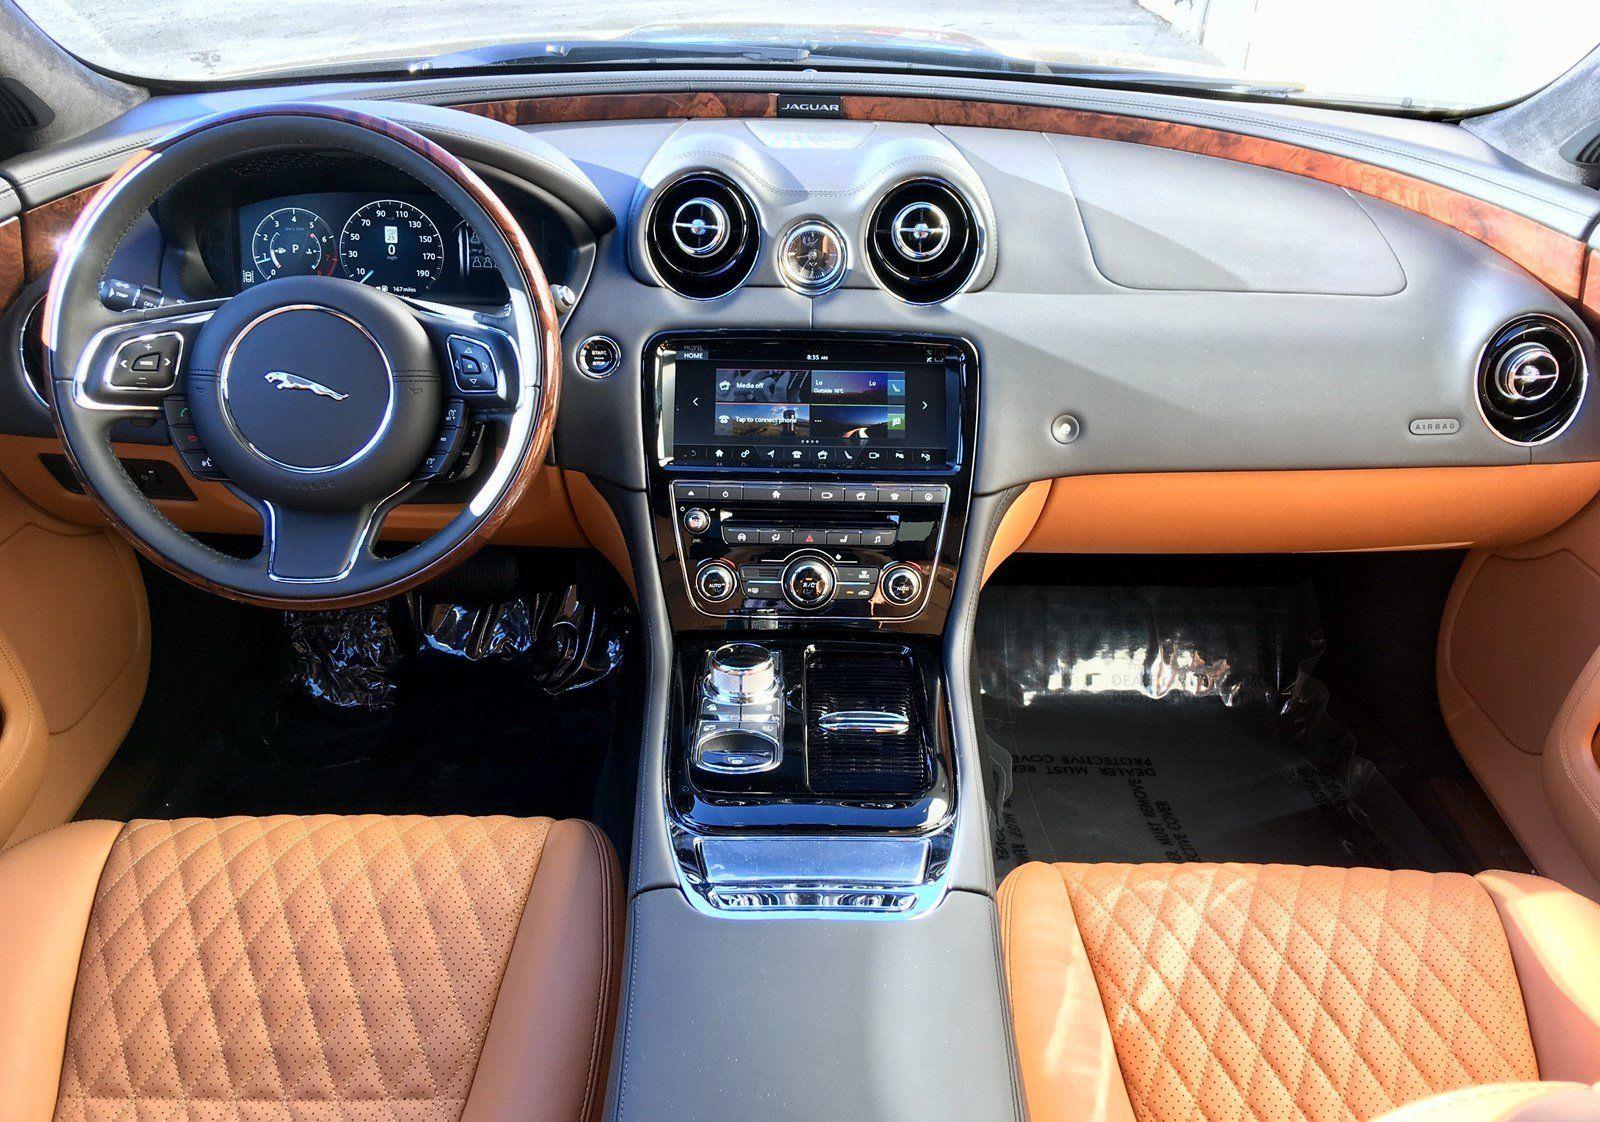 New 2018 Jaguar Xj L Portfolio For Sale In Ventura Ca 93003 Sedan Details 474476332 Autotrader Luxury Automotive Jaguar Xj Autotrader